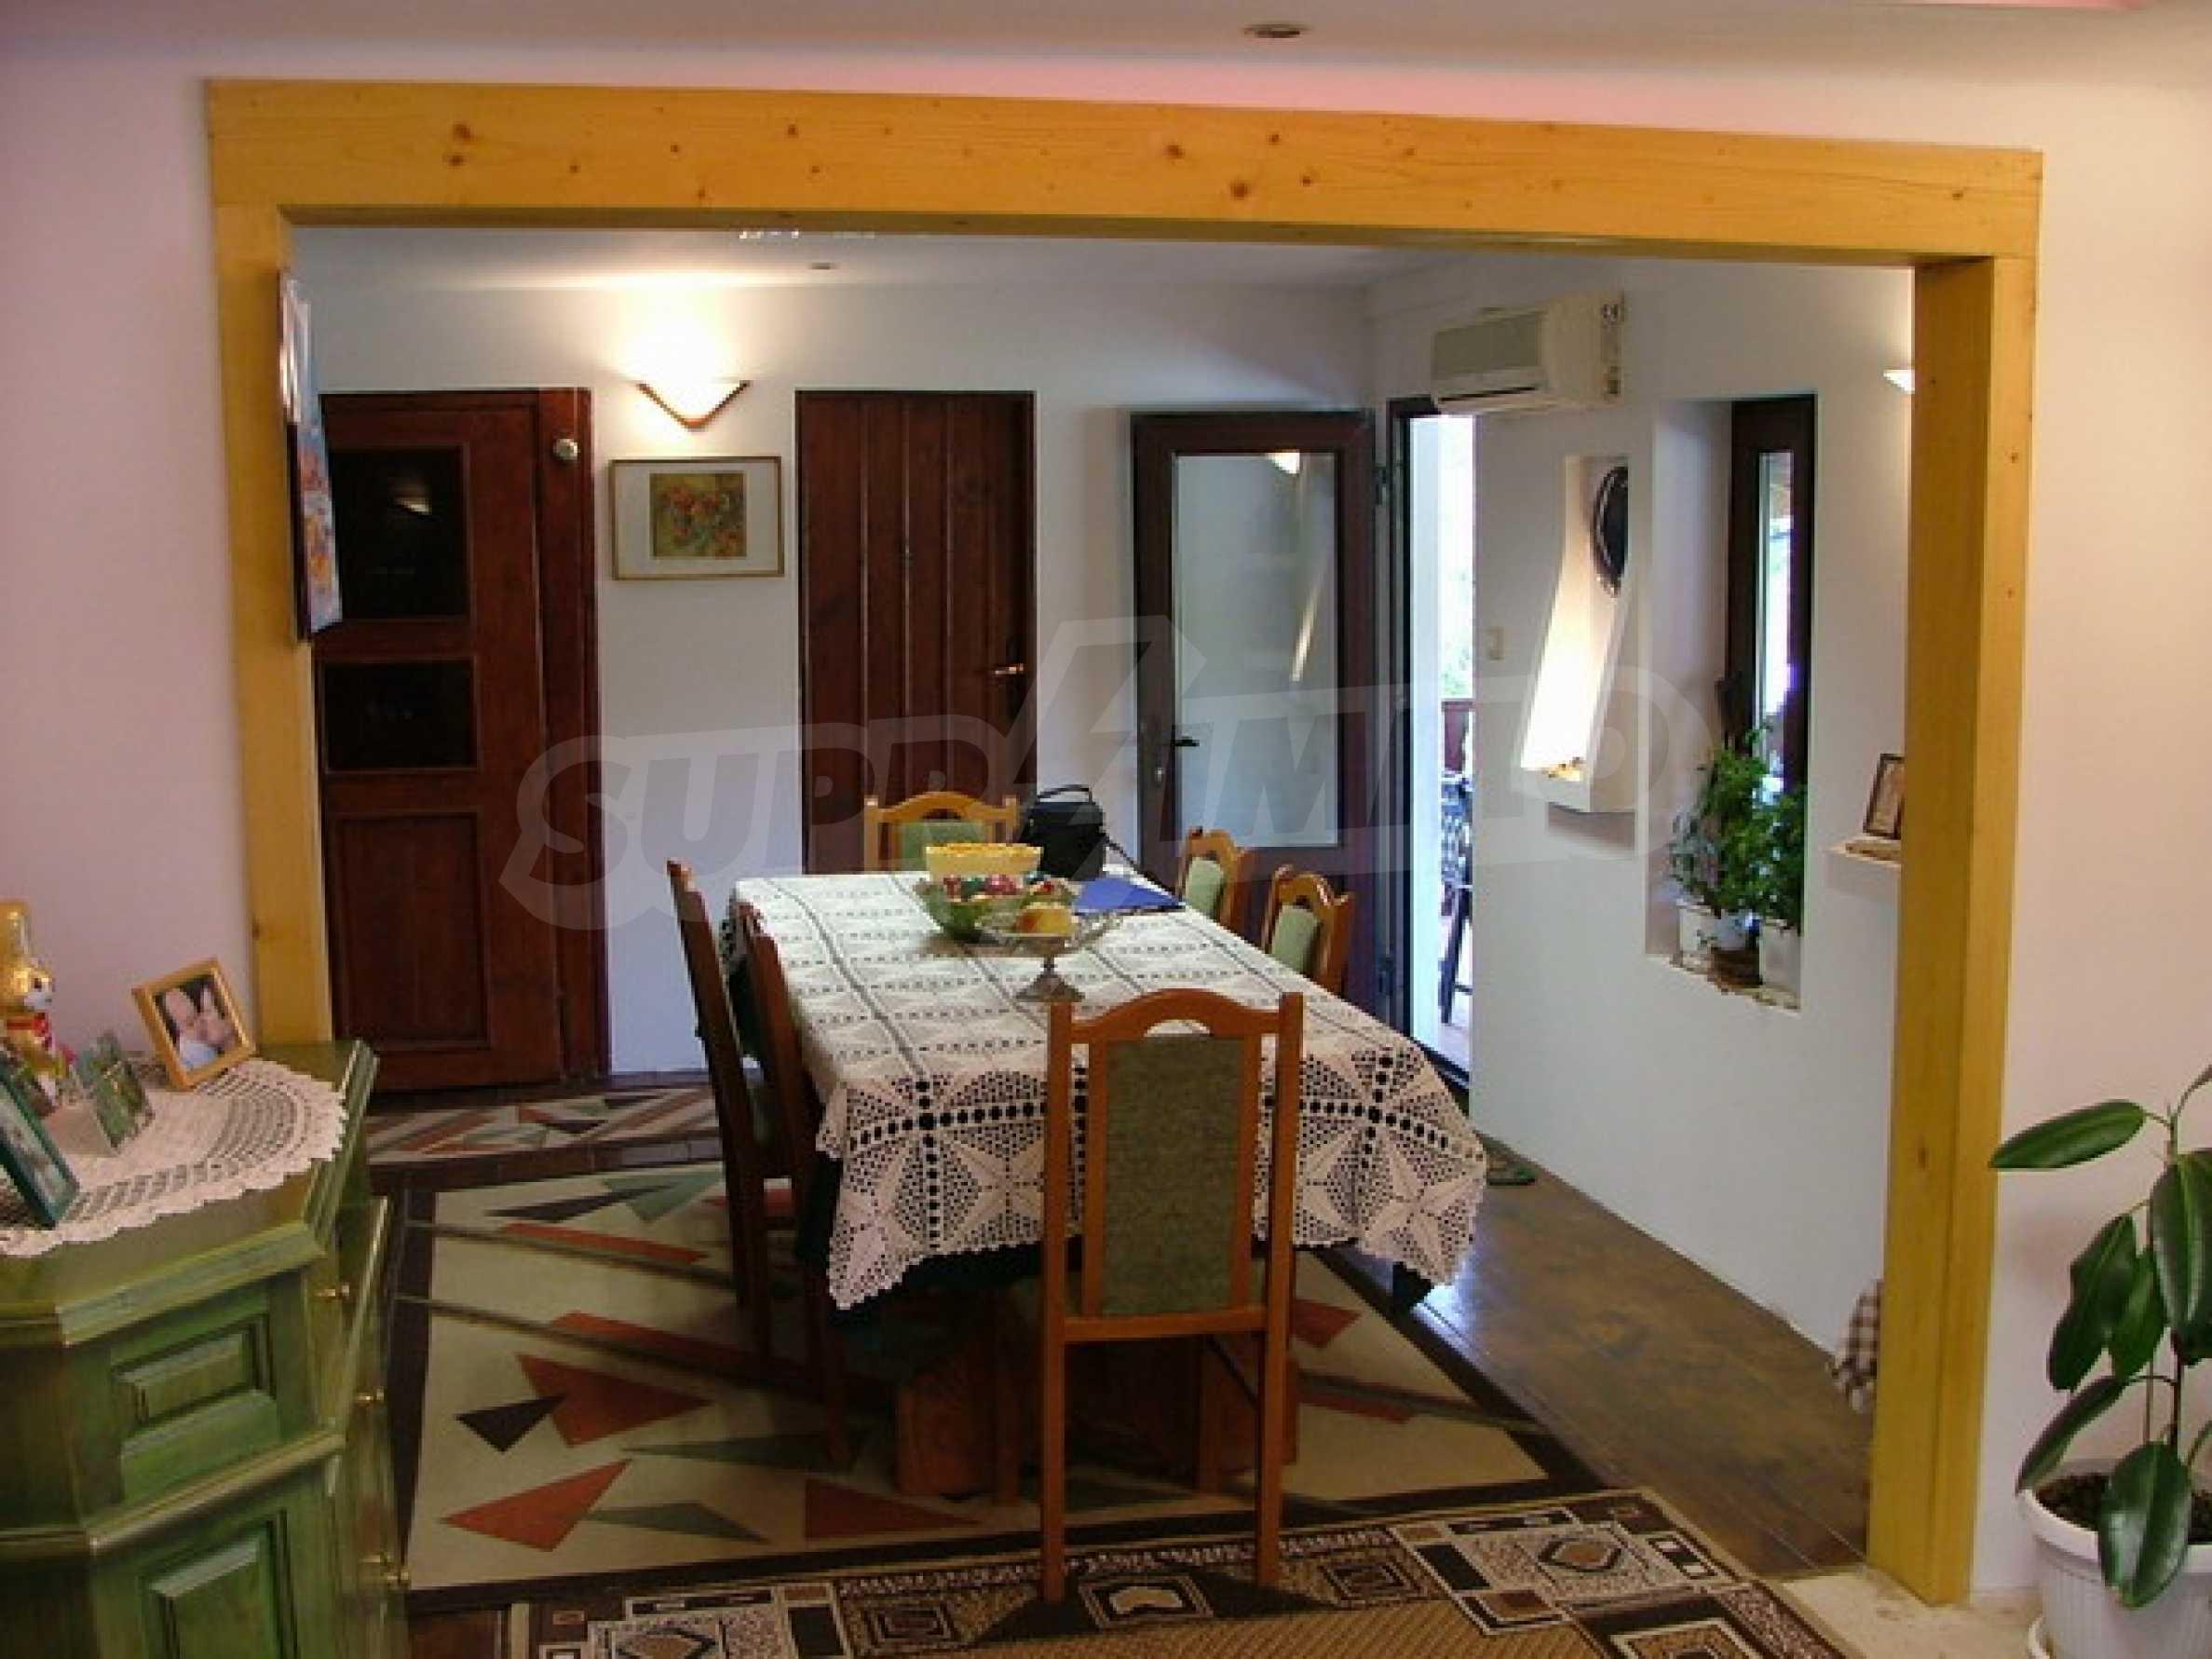 Stilvoll renovierte Villa 12 km entfernt. von Veliko Tarnovo 7